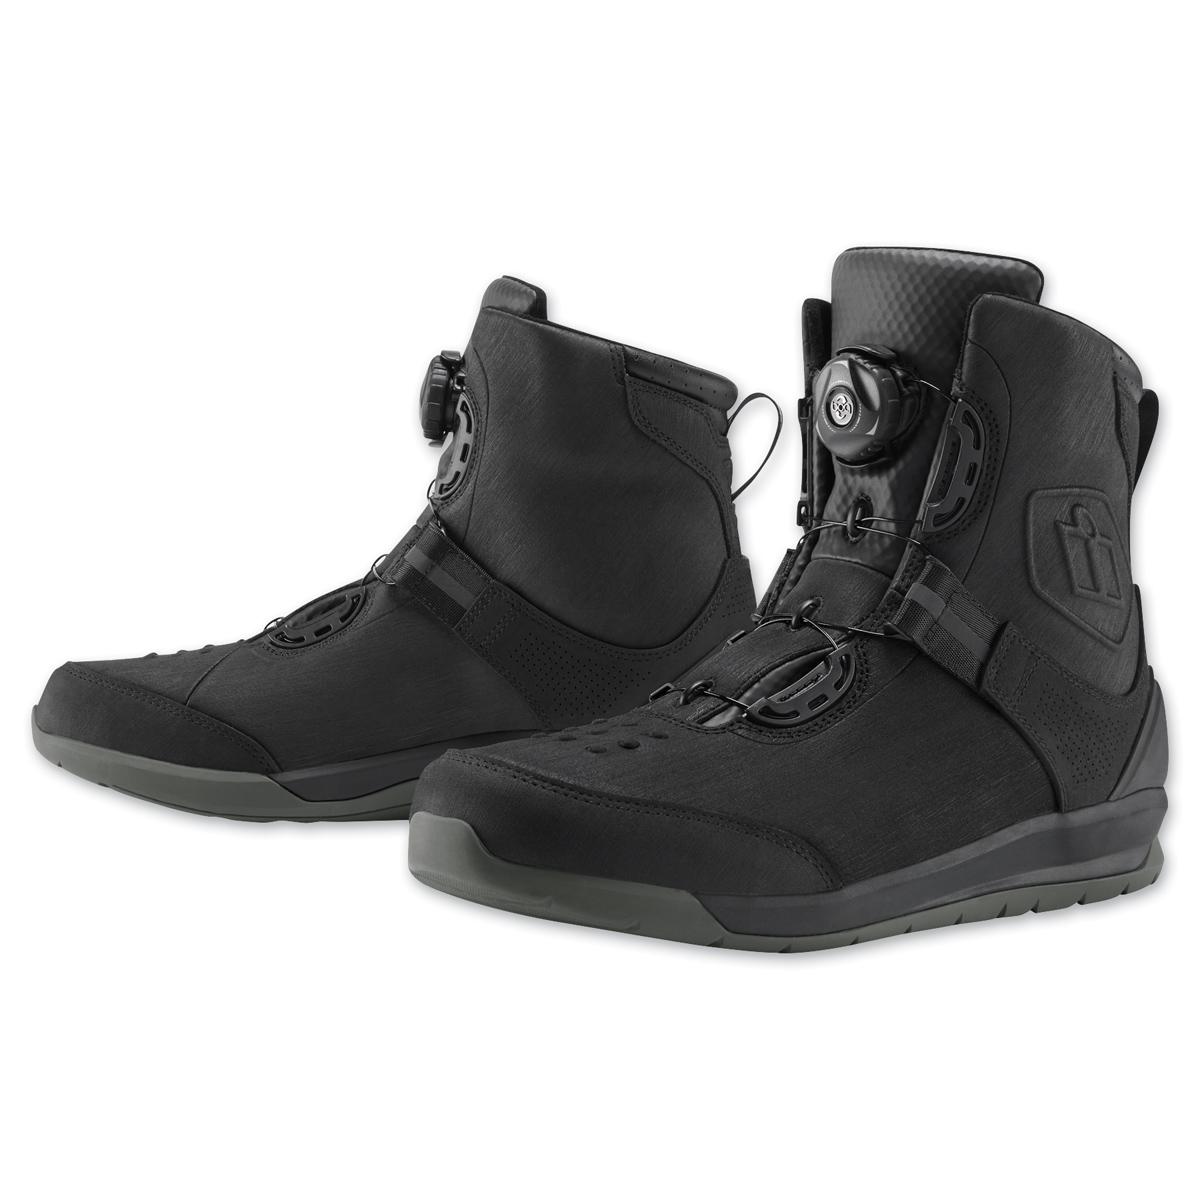 ICON Men's Patrol 2 Black Boots